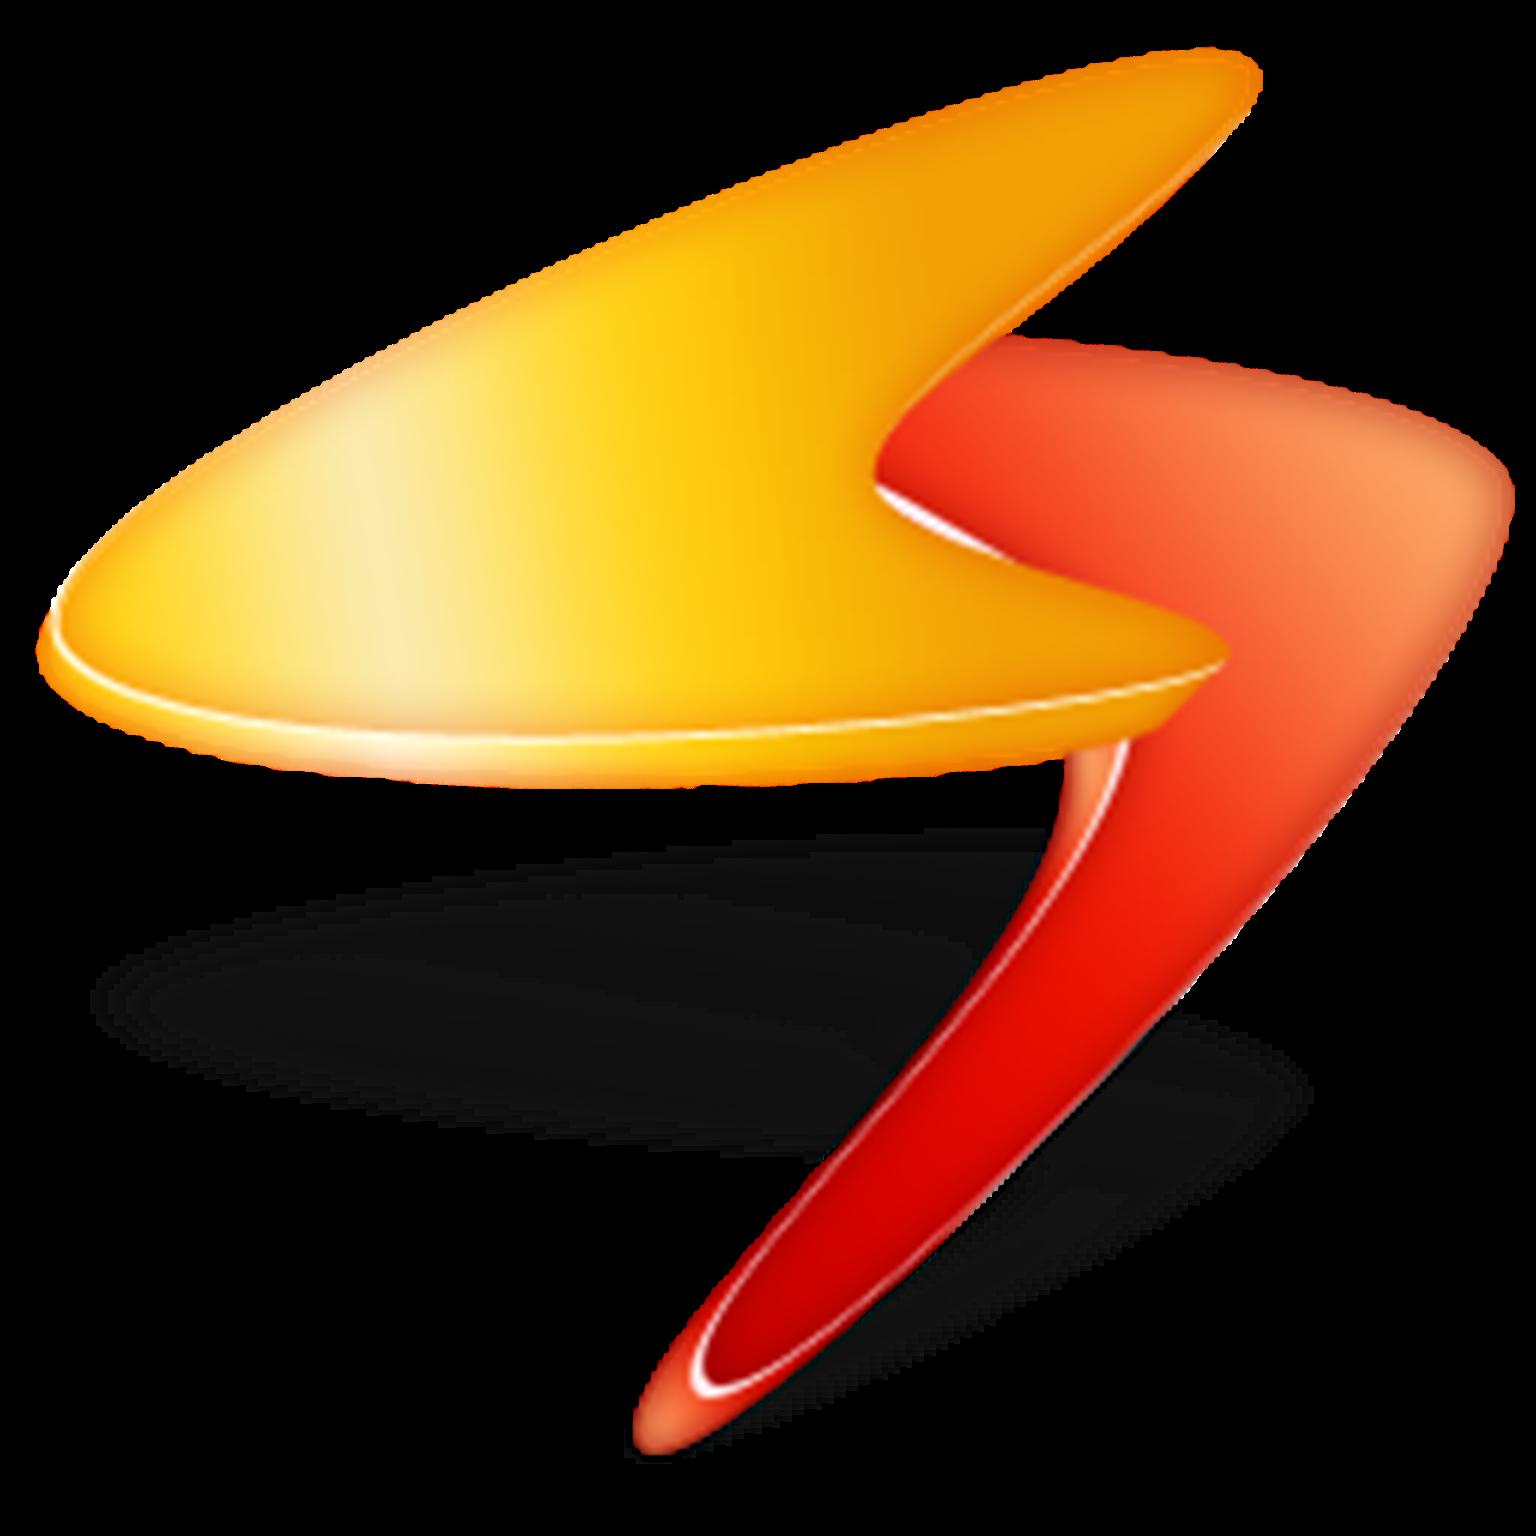 WatFile.com Download Free Download Accelerator Plus 10 (Software + Crack) ~ CYA group